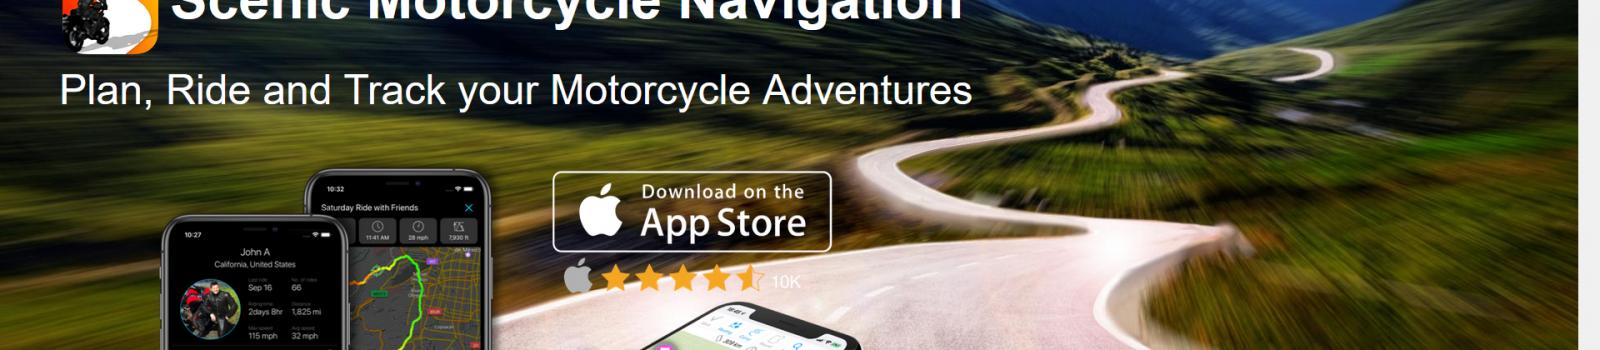 Feb. 18 Zoom Meeting – Navigation Apps